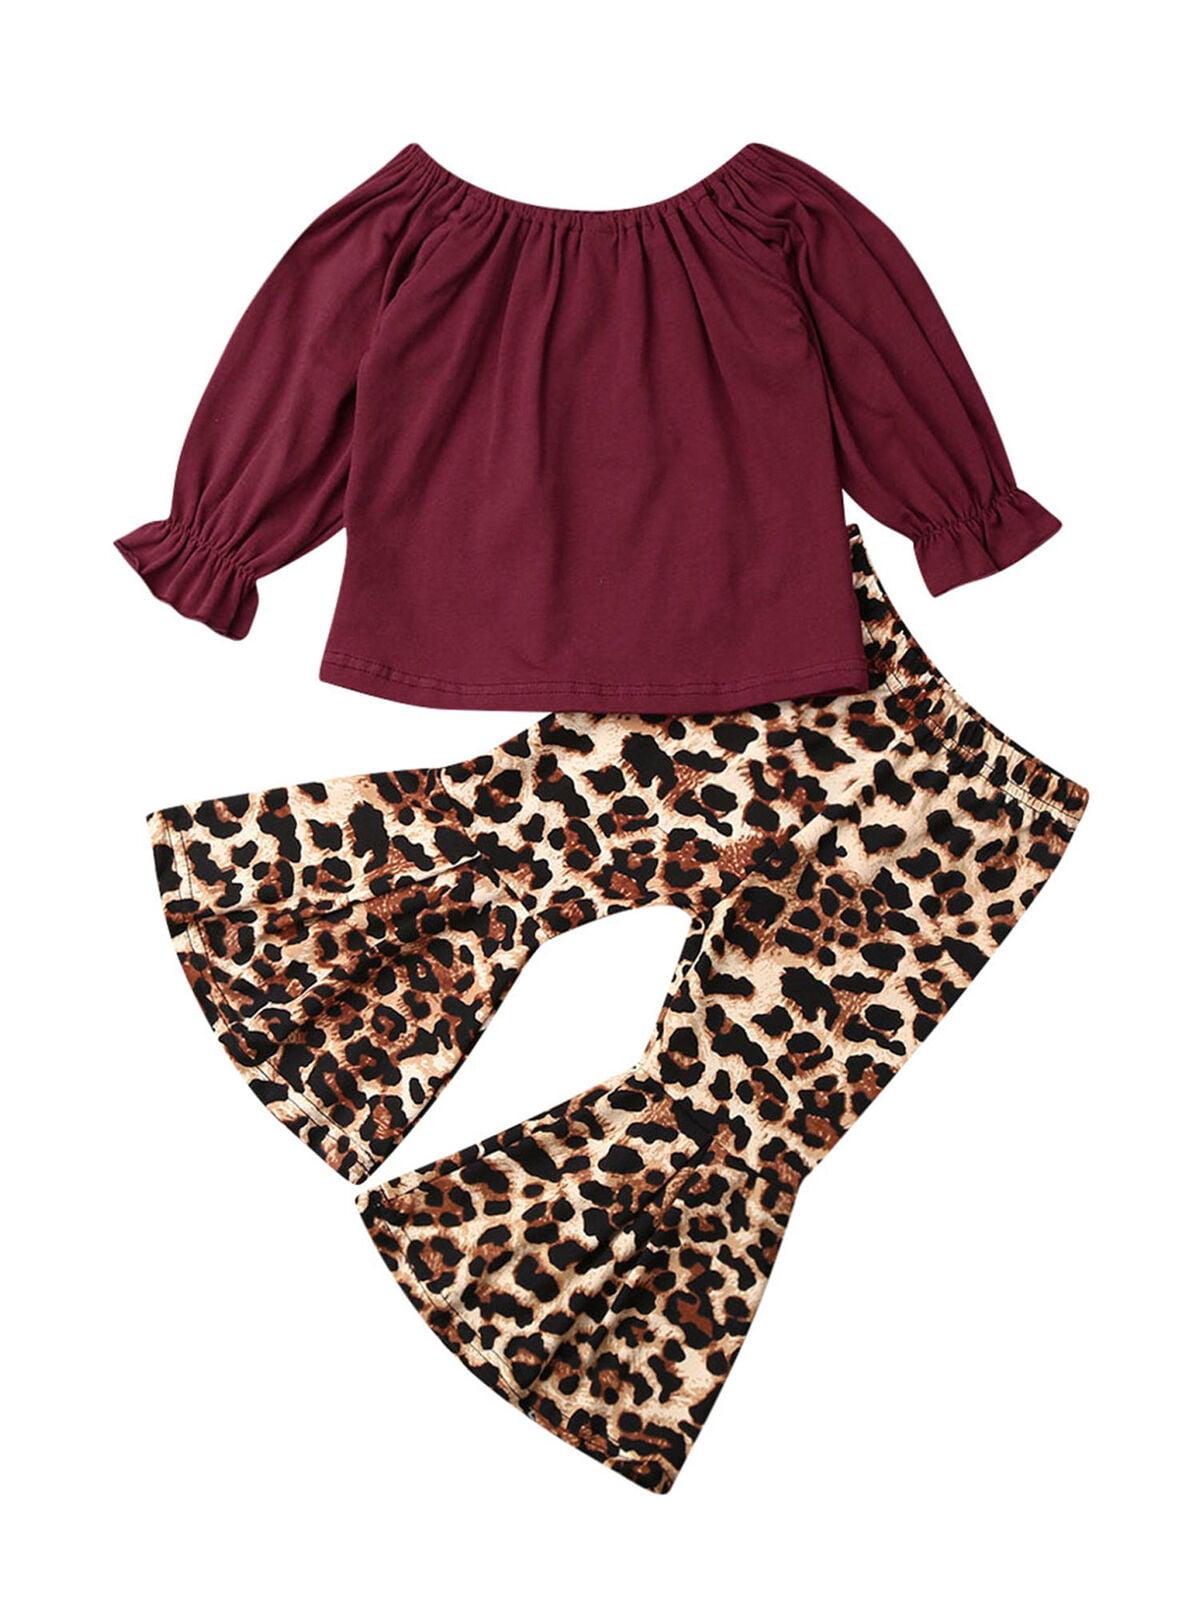 Newborn Kids Baby Girl Tops T-shirt Flared Pants Bell-Bottom Fall Outfits Set